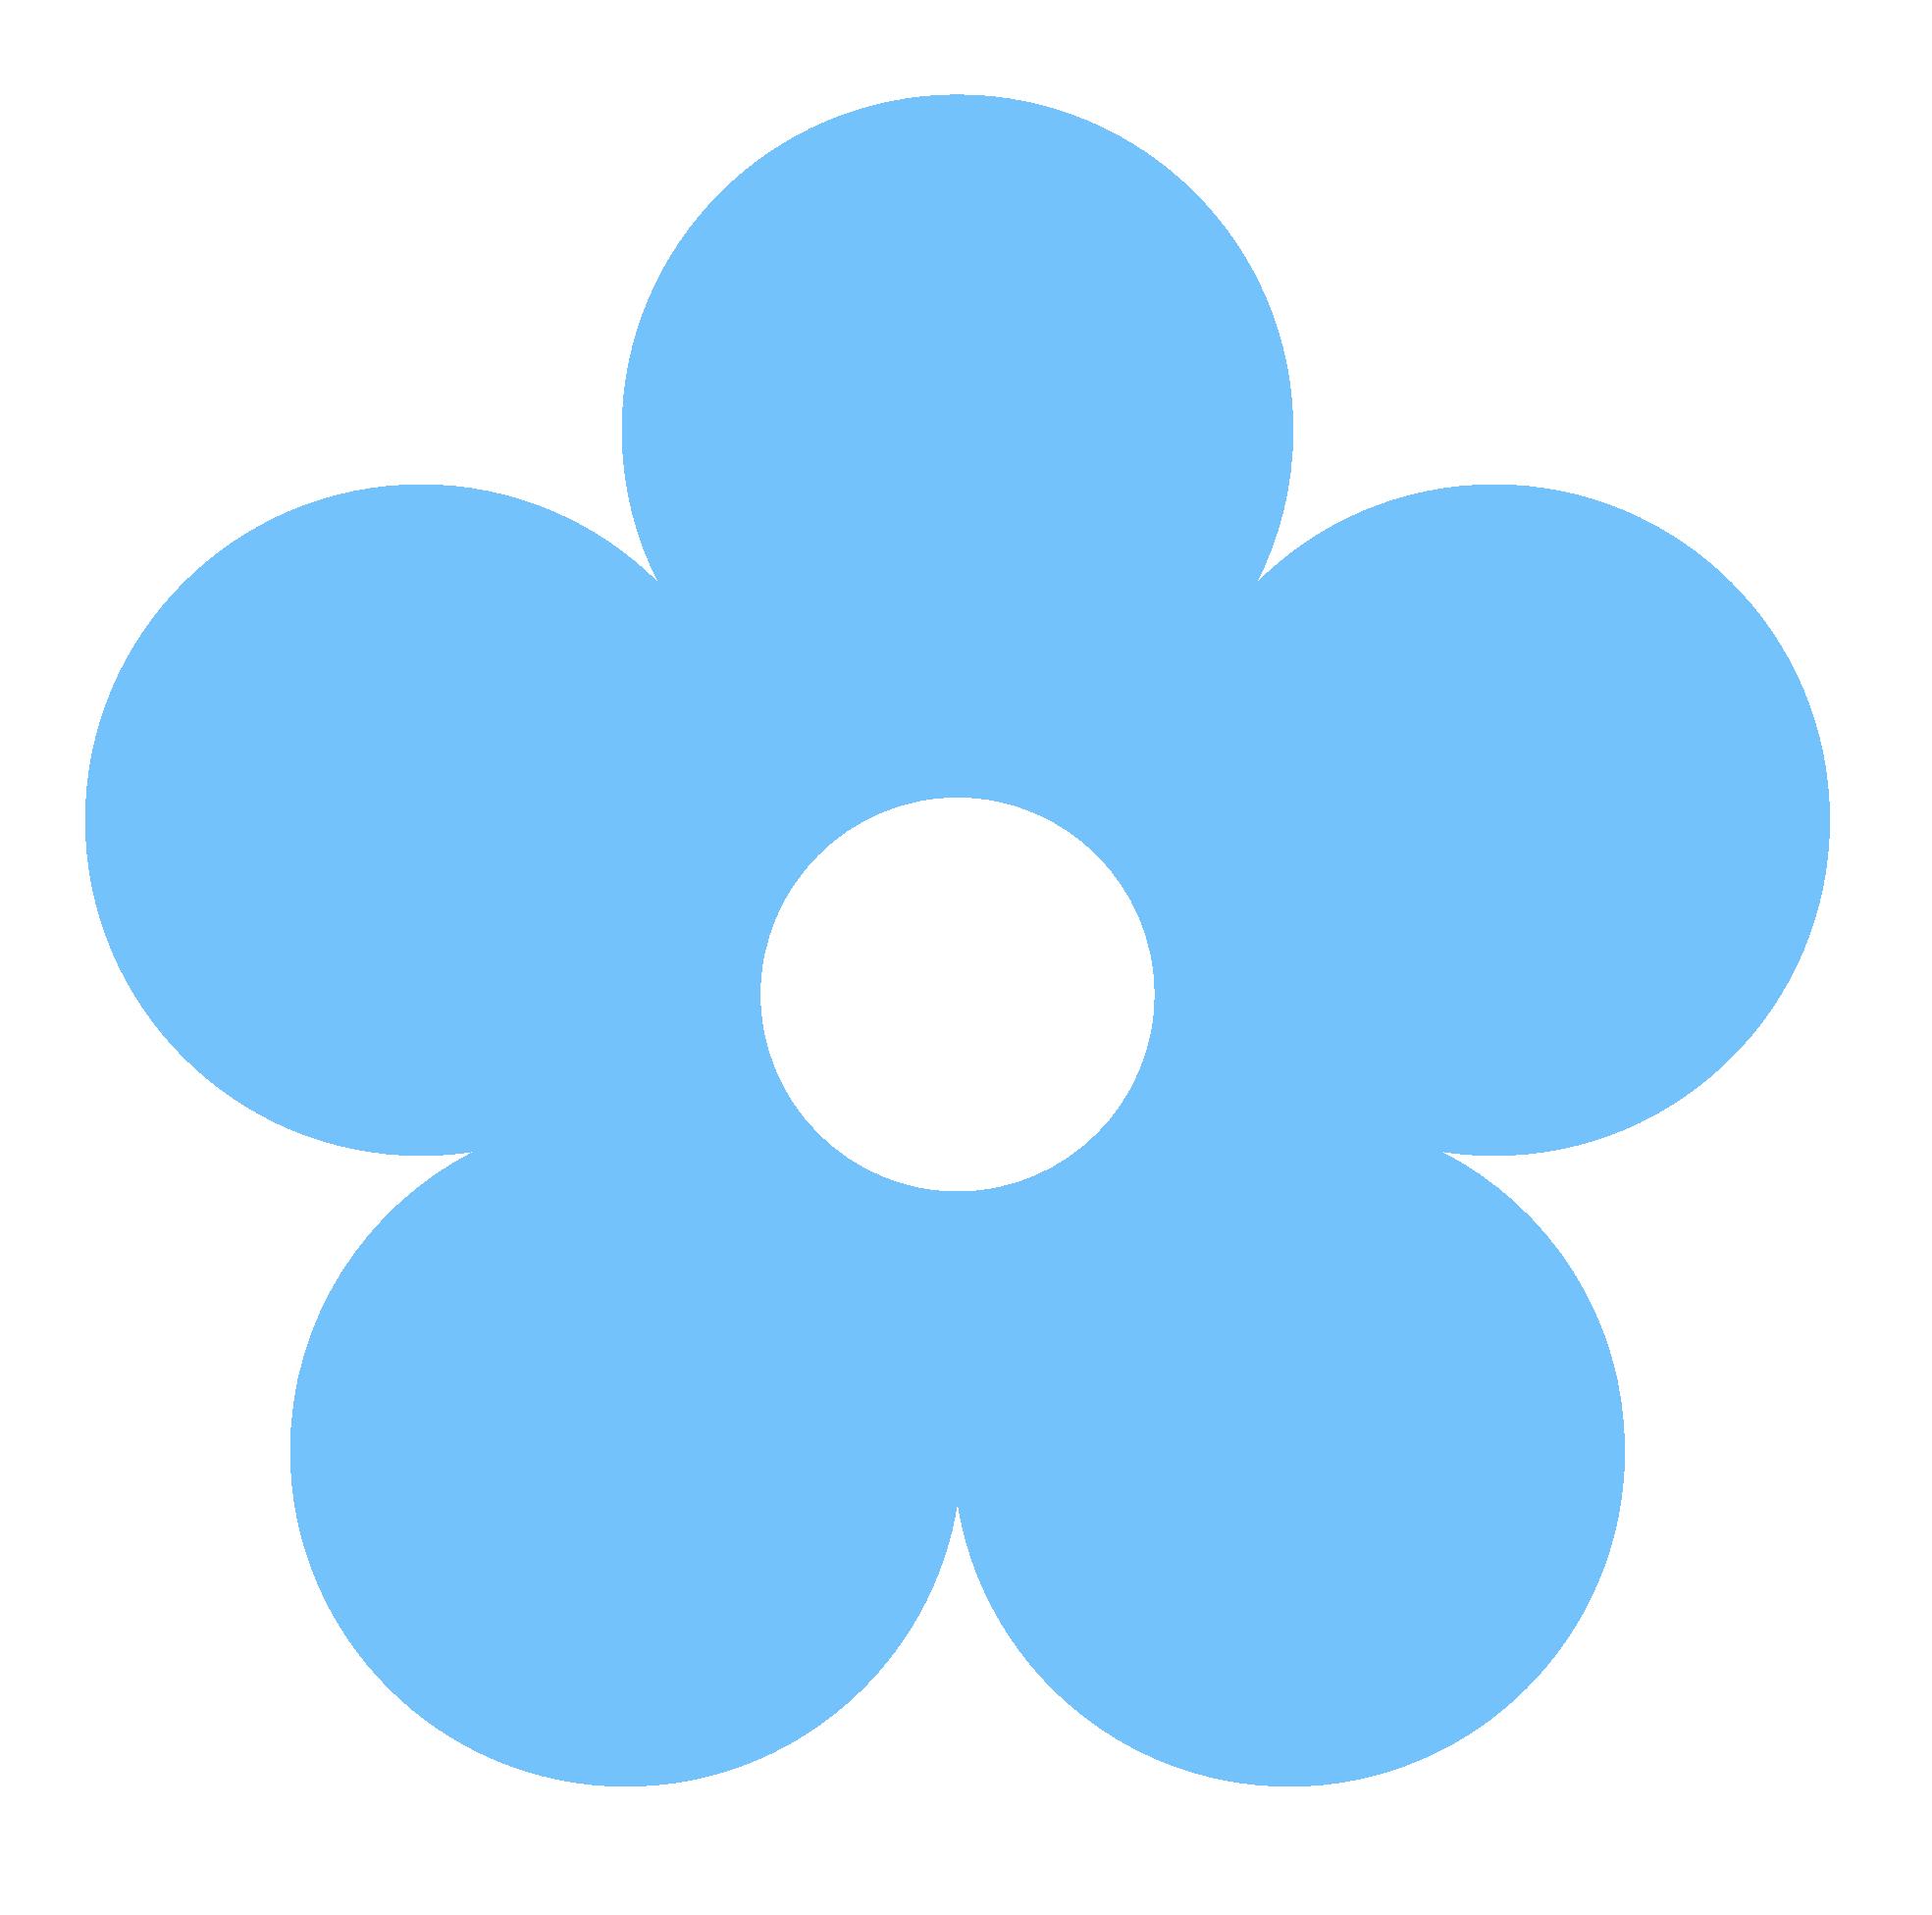 Clipart blue flower.